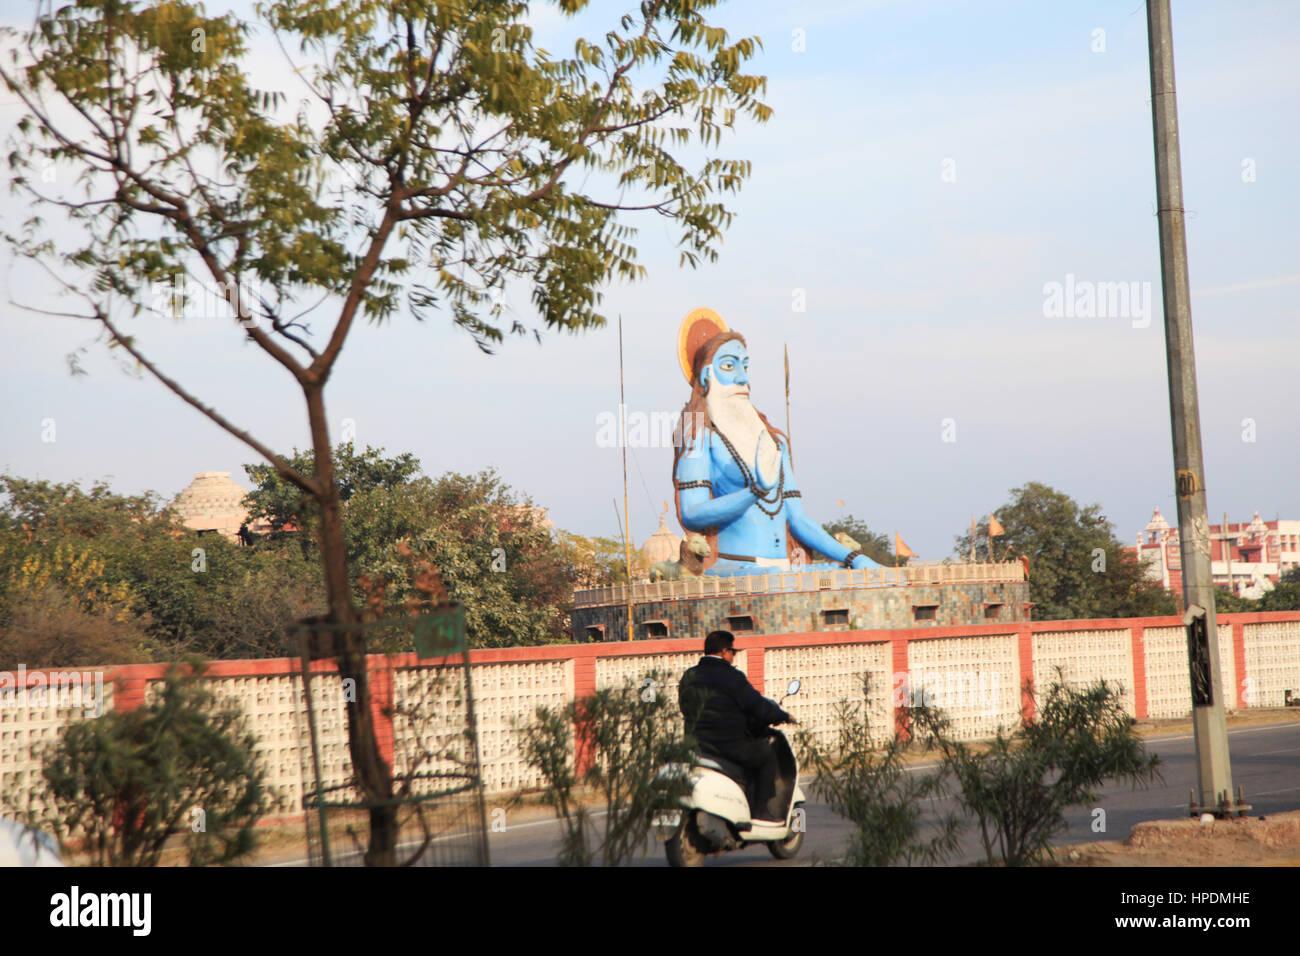 Statue at Asthal Bohar in Rohtak, India,  (Photo Copyright © by Saji Maramon) - Stock Image